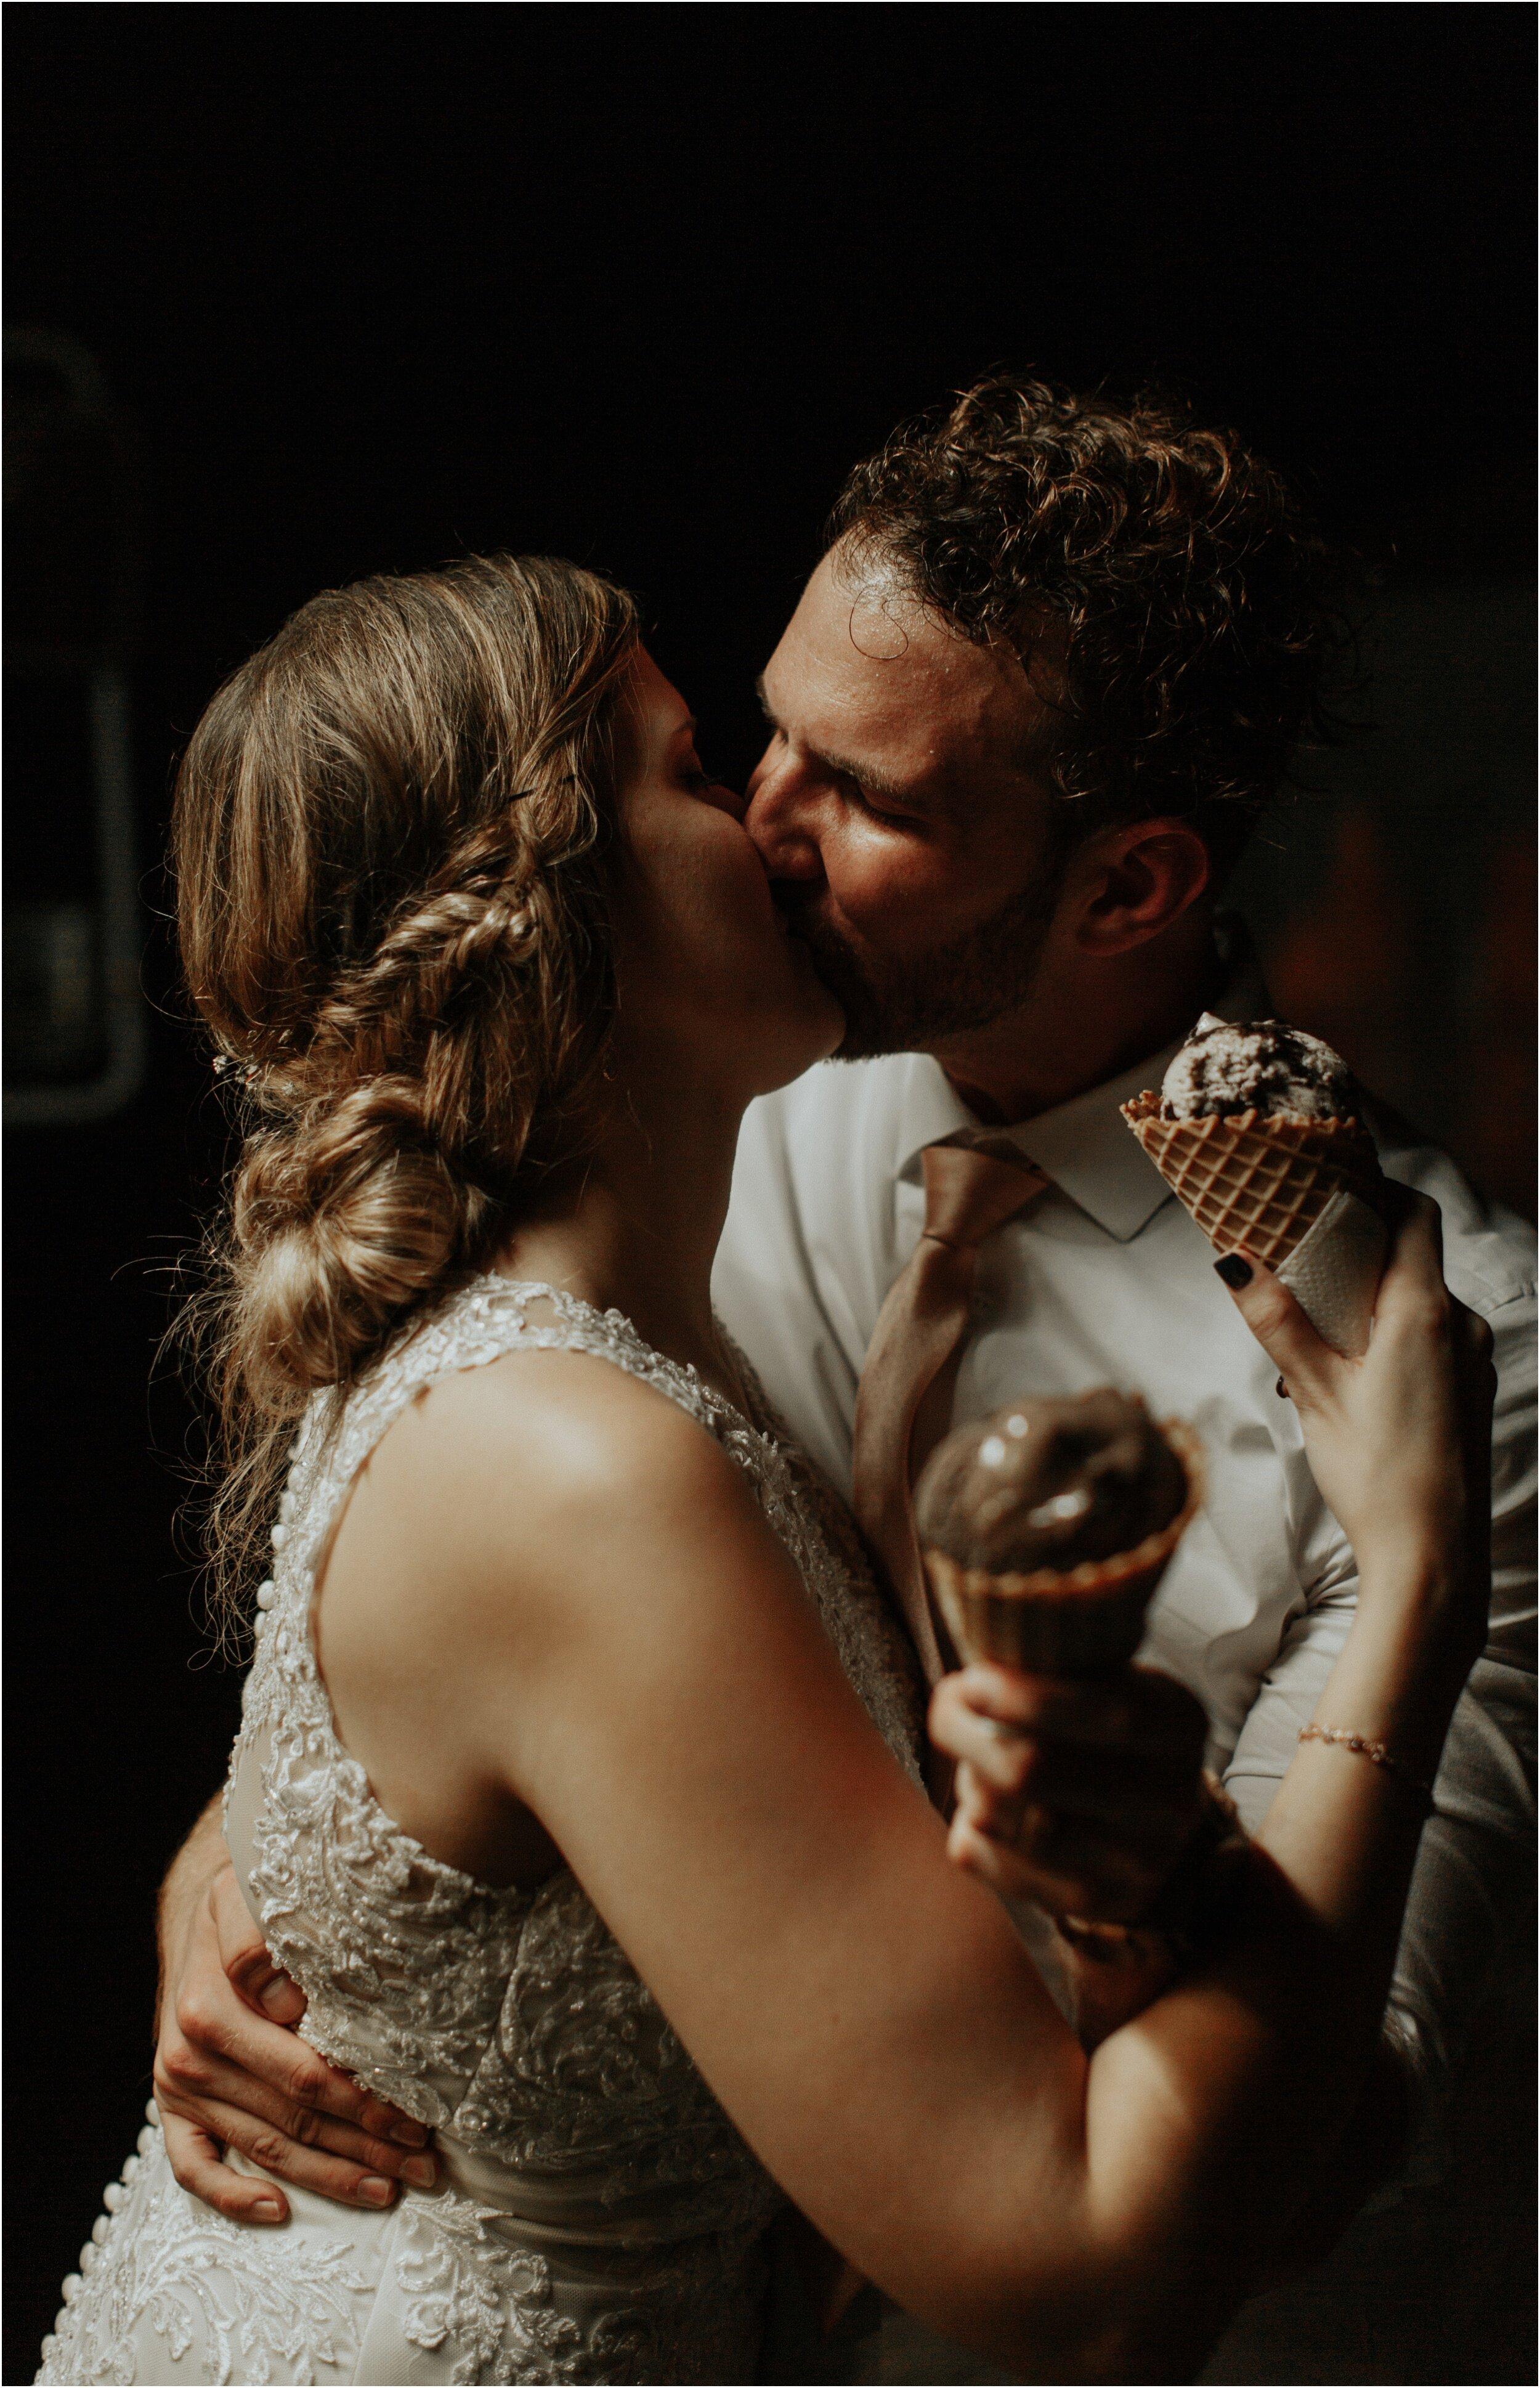 steph-and-jordan-cox-our-wedding-historic-shady-lane-compass-wedding-collective-hazel-lining-photography-destination-elopement-wedding-engagement-photography_0101.jpg